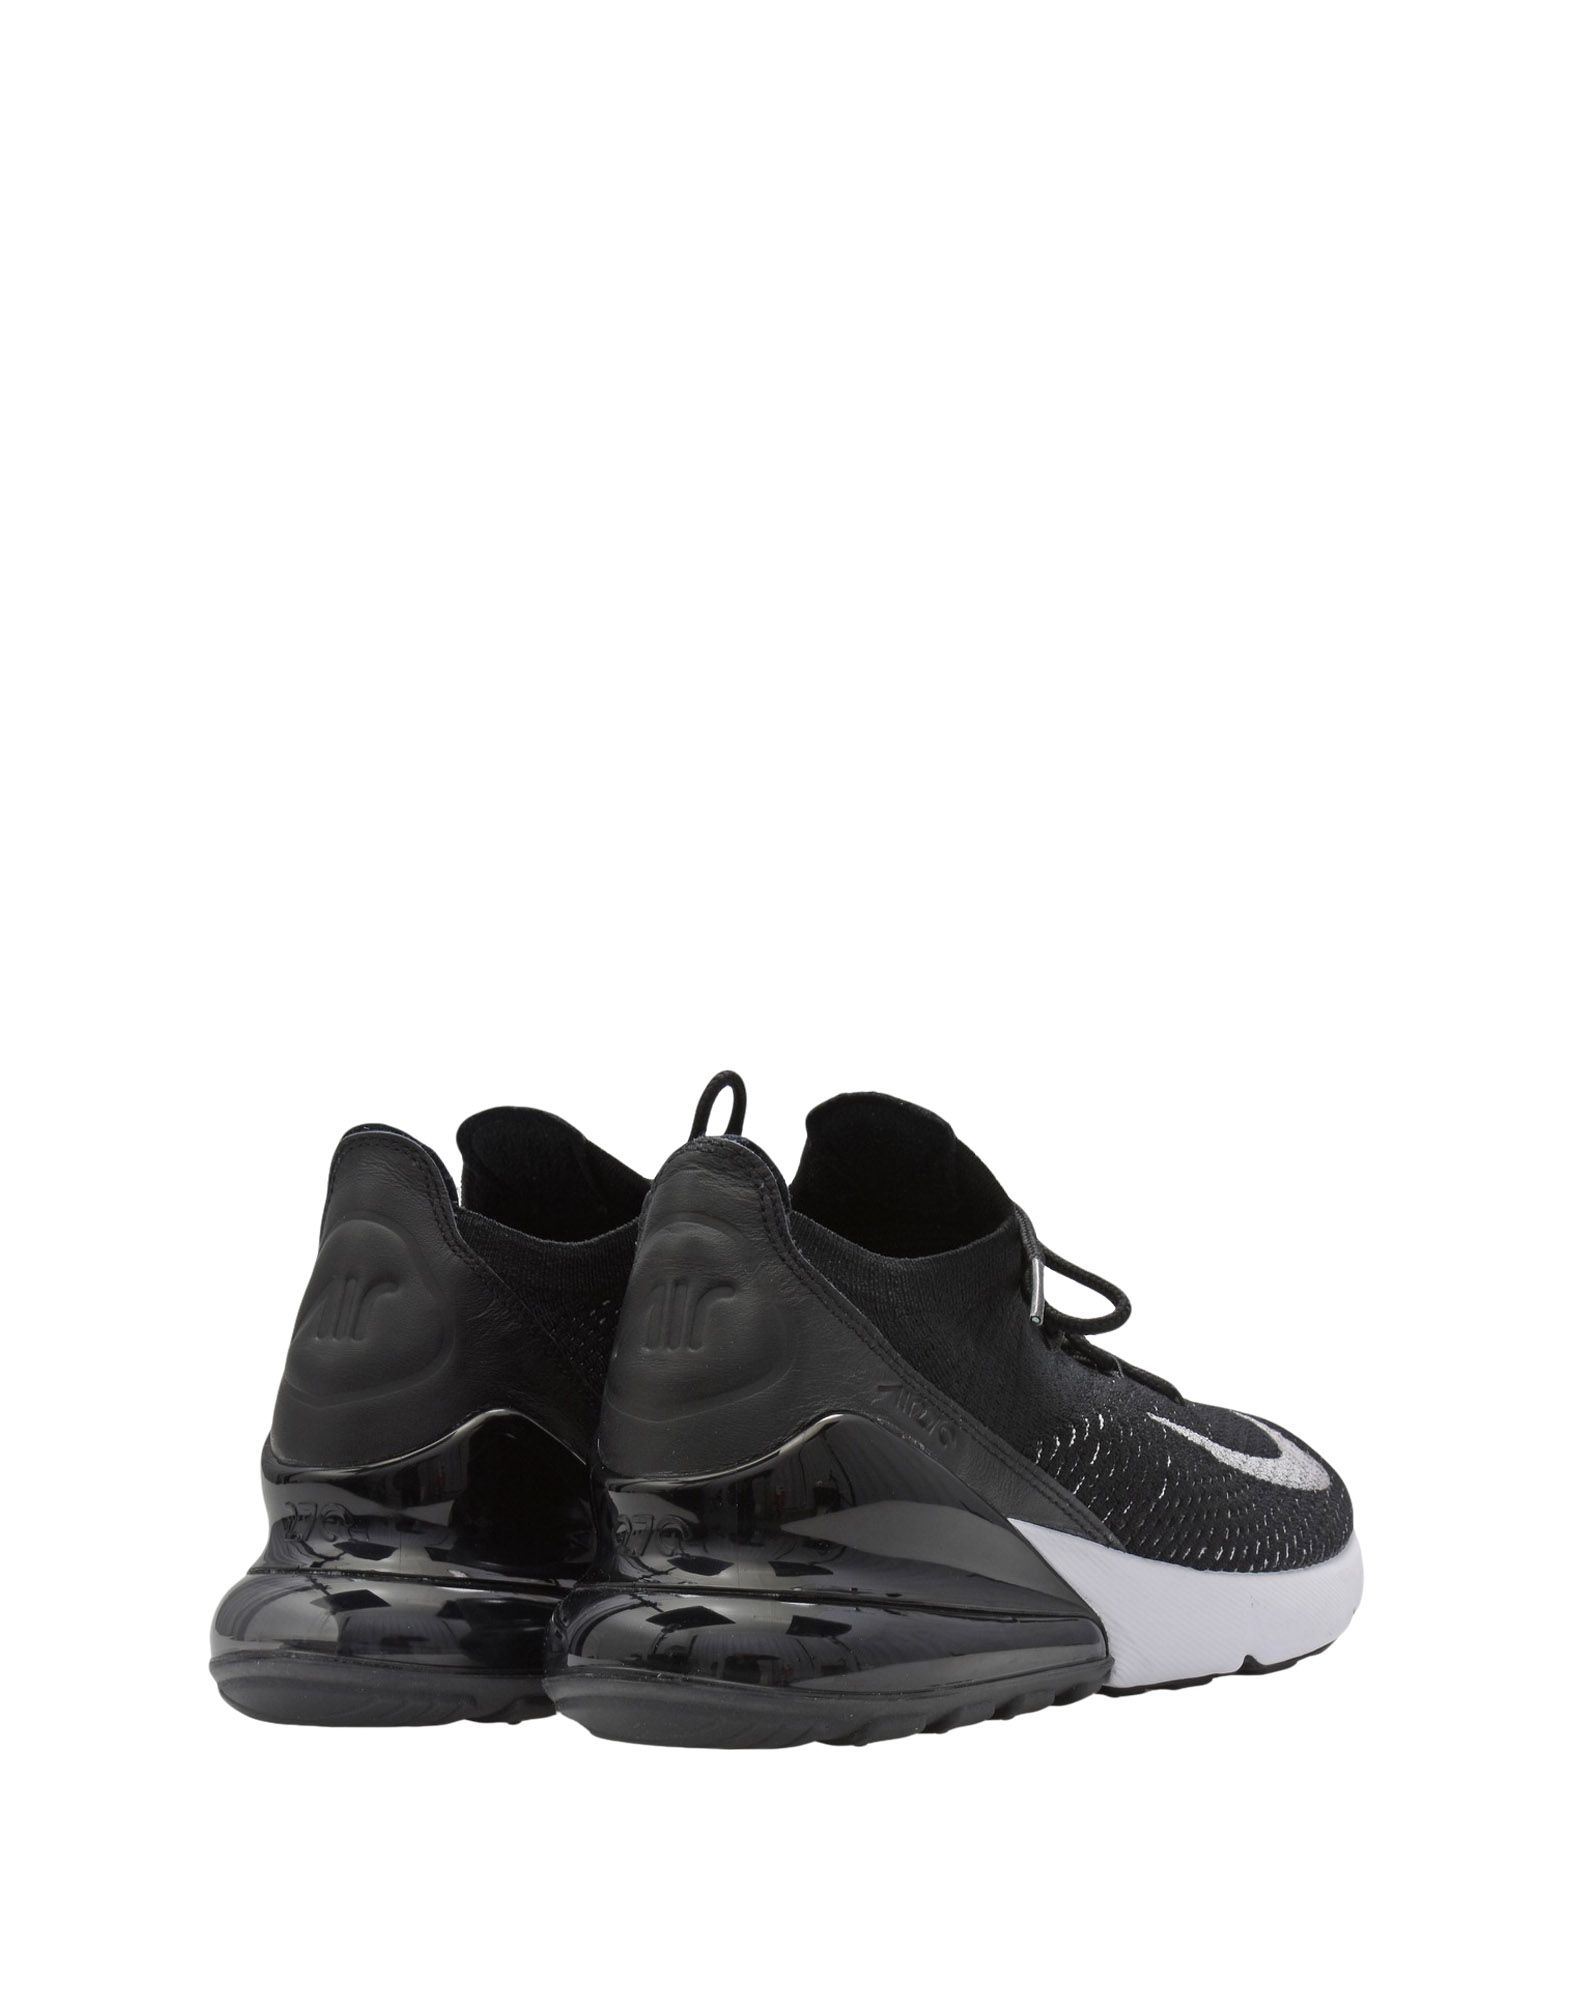 Sneakers Nike W Air Max 270 Flyknit - Femme - Sneakers Nike sur ...